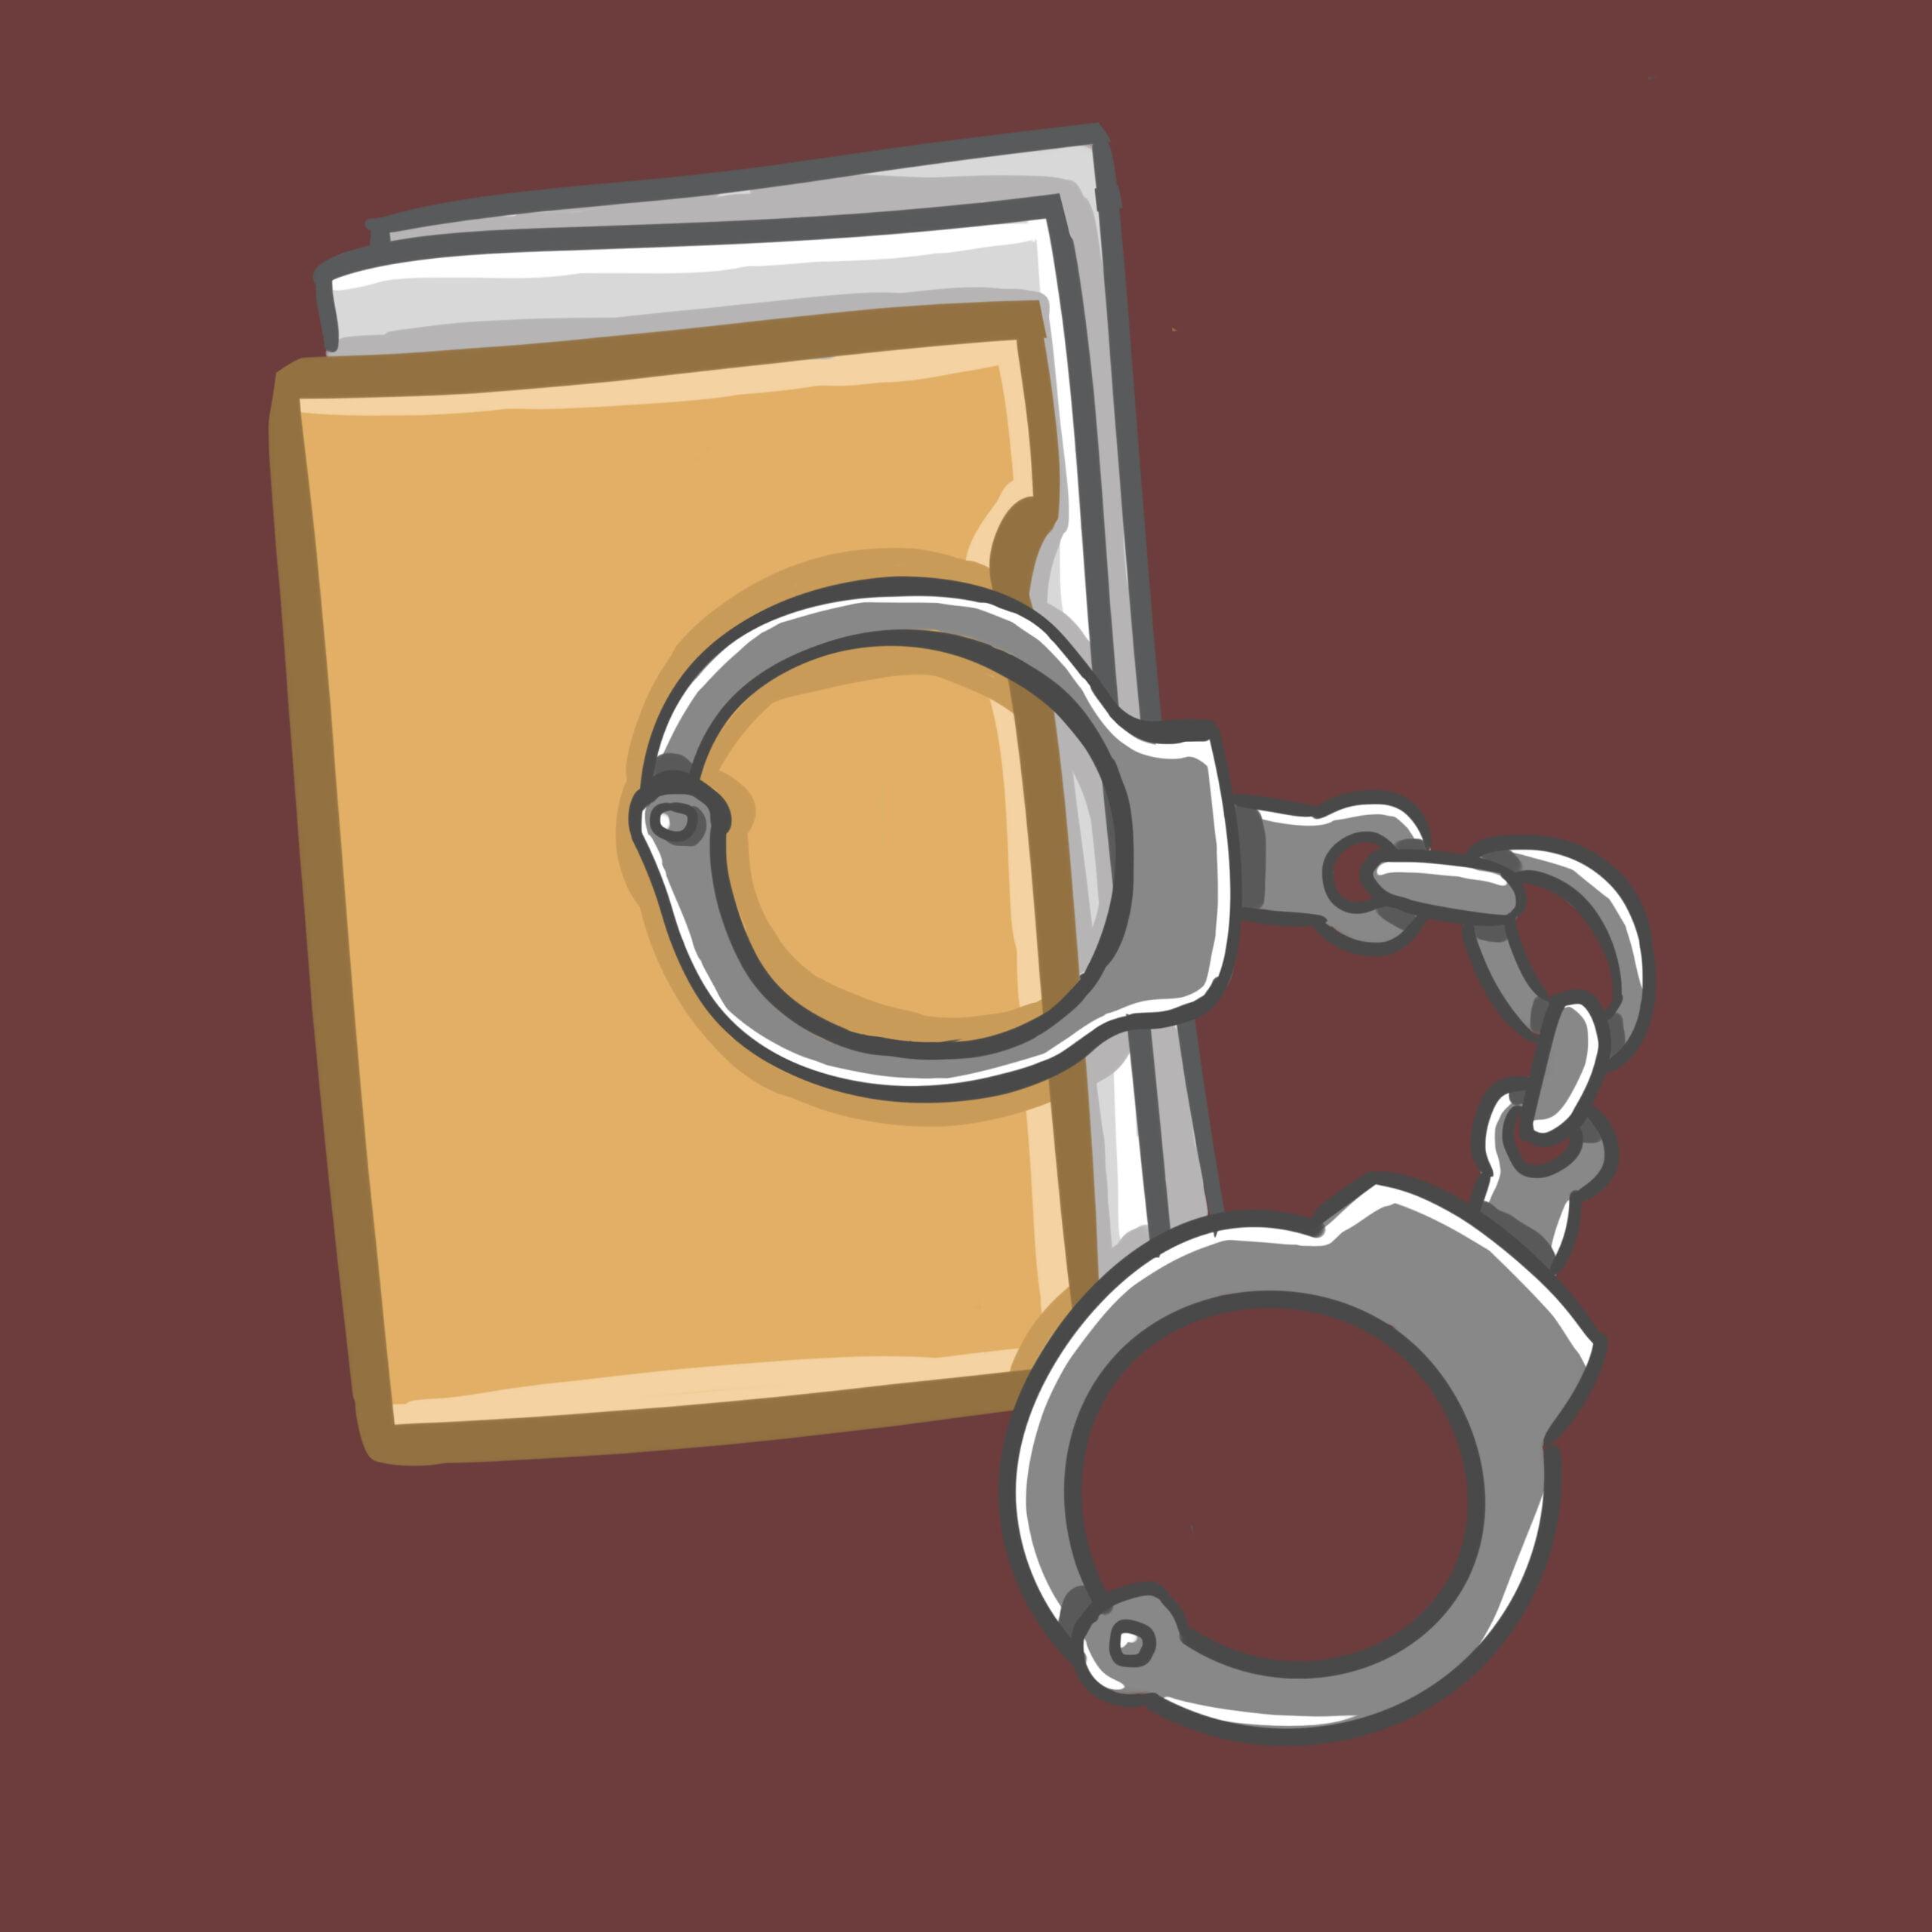 Law article illustration designed by Allison Christensen for 360 MAGAZINE